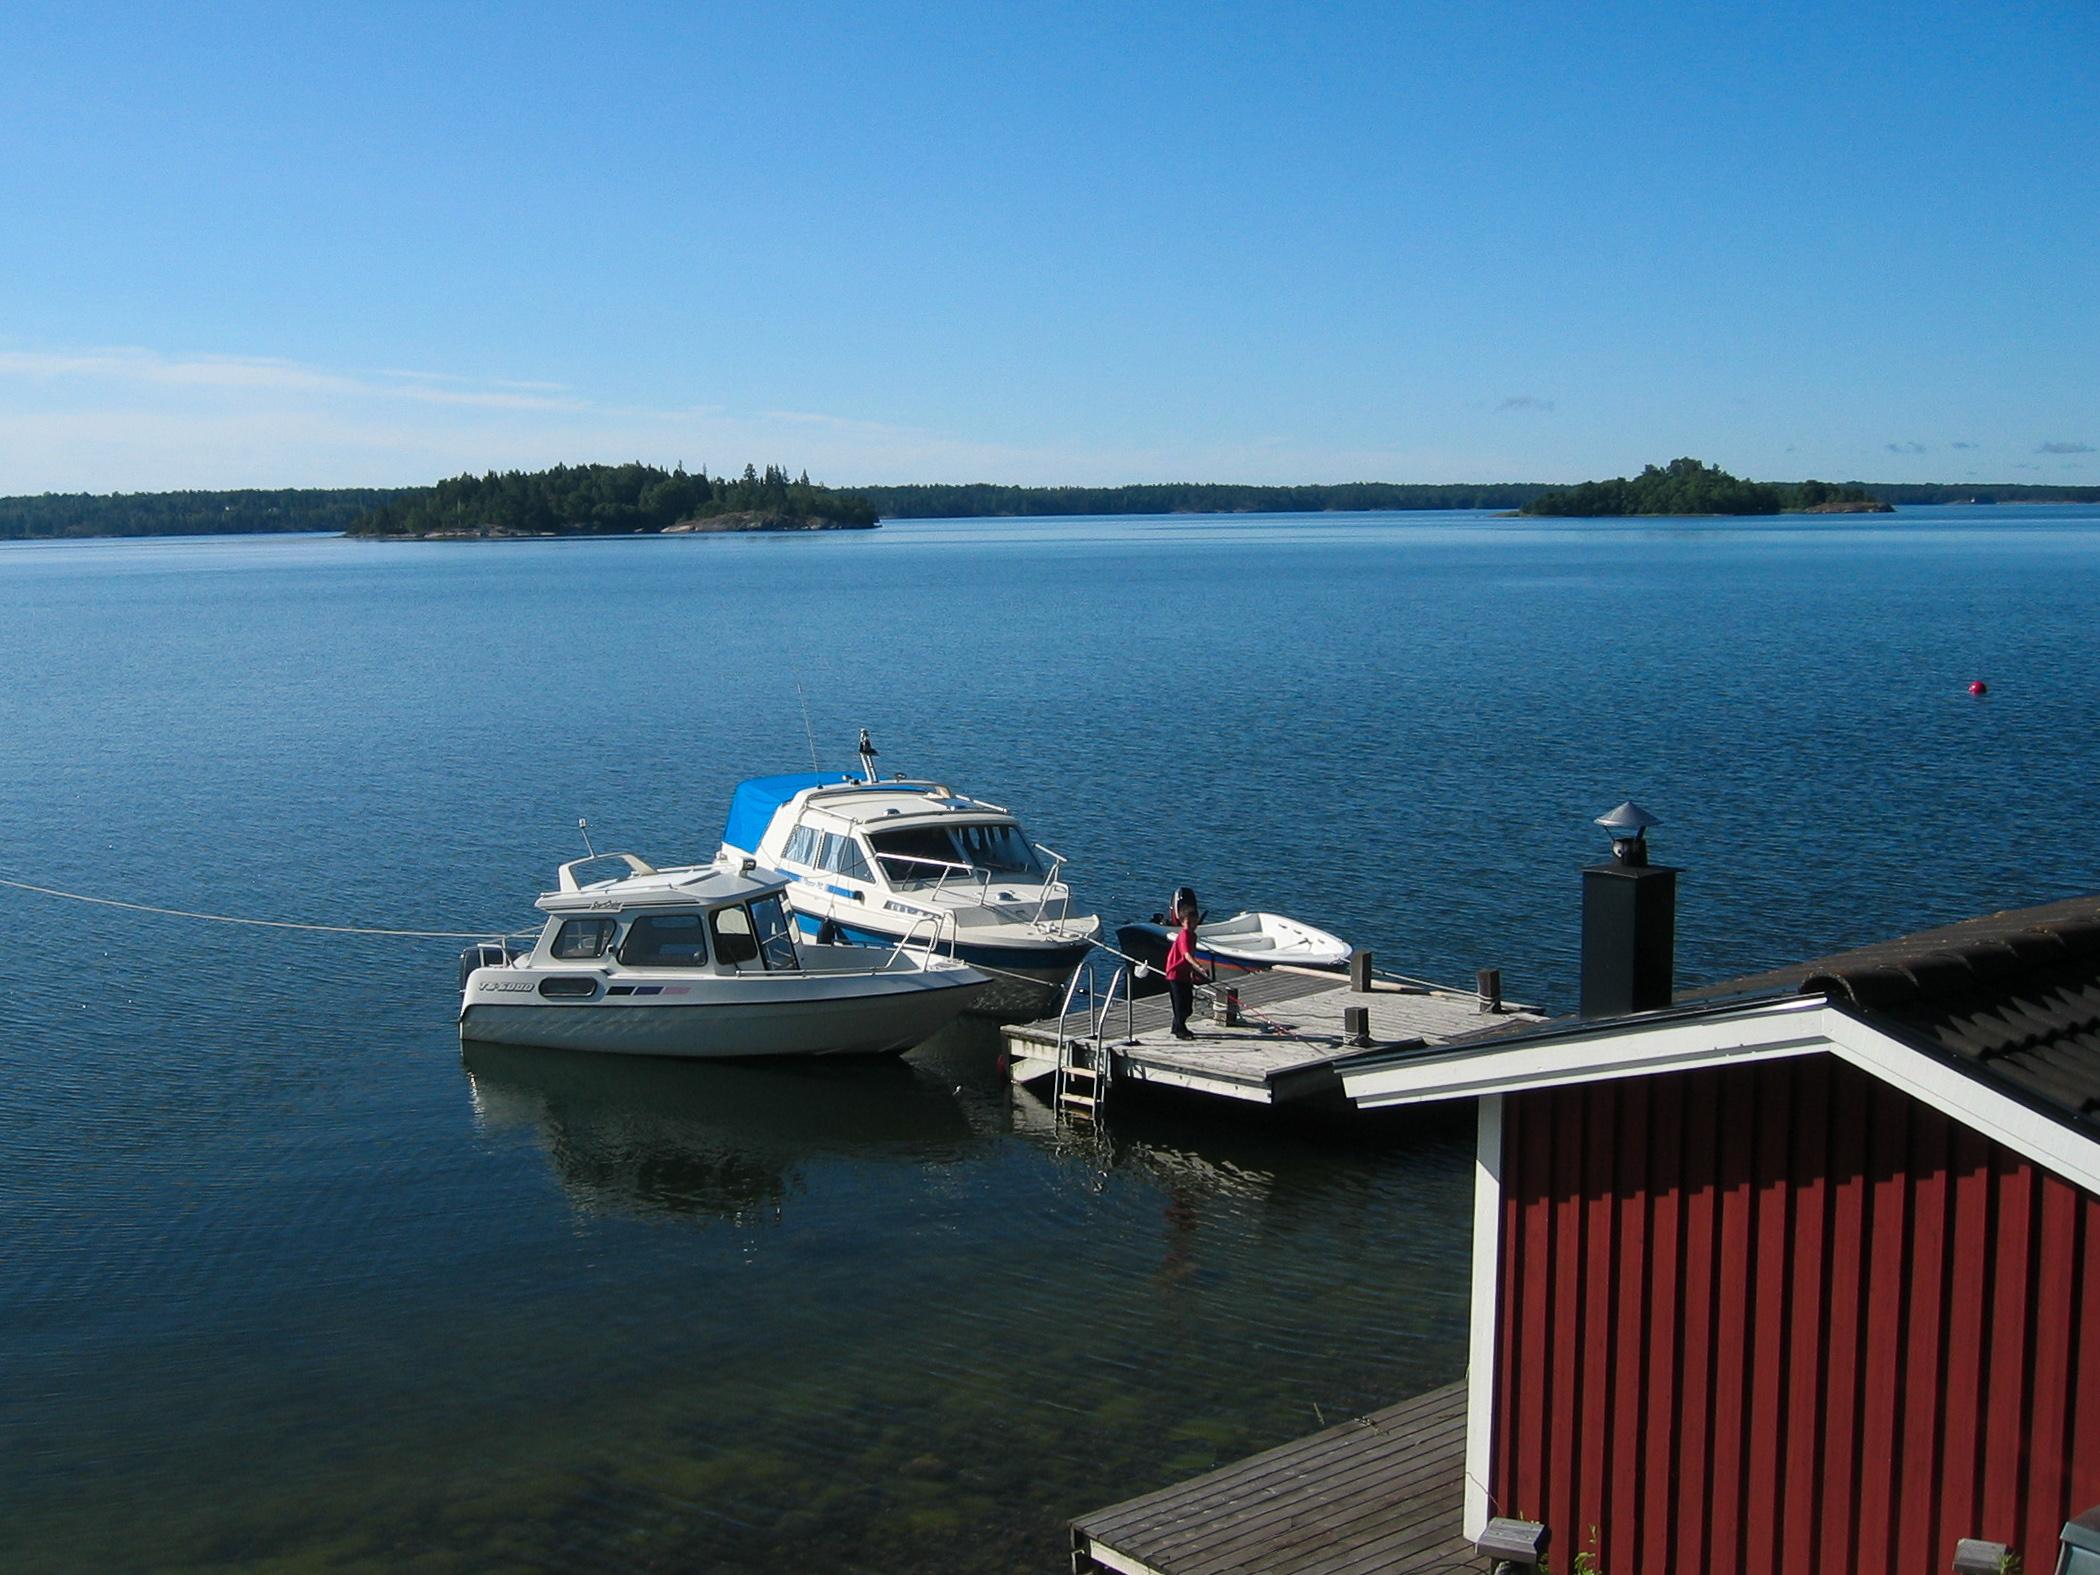 View from the Island of Gränö